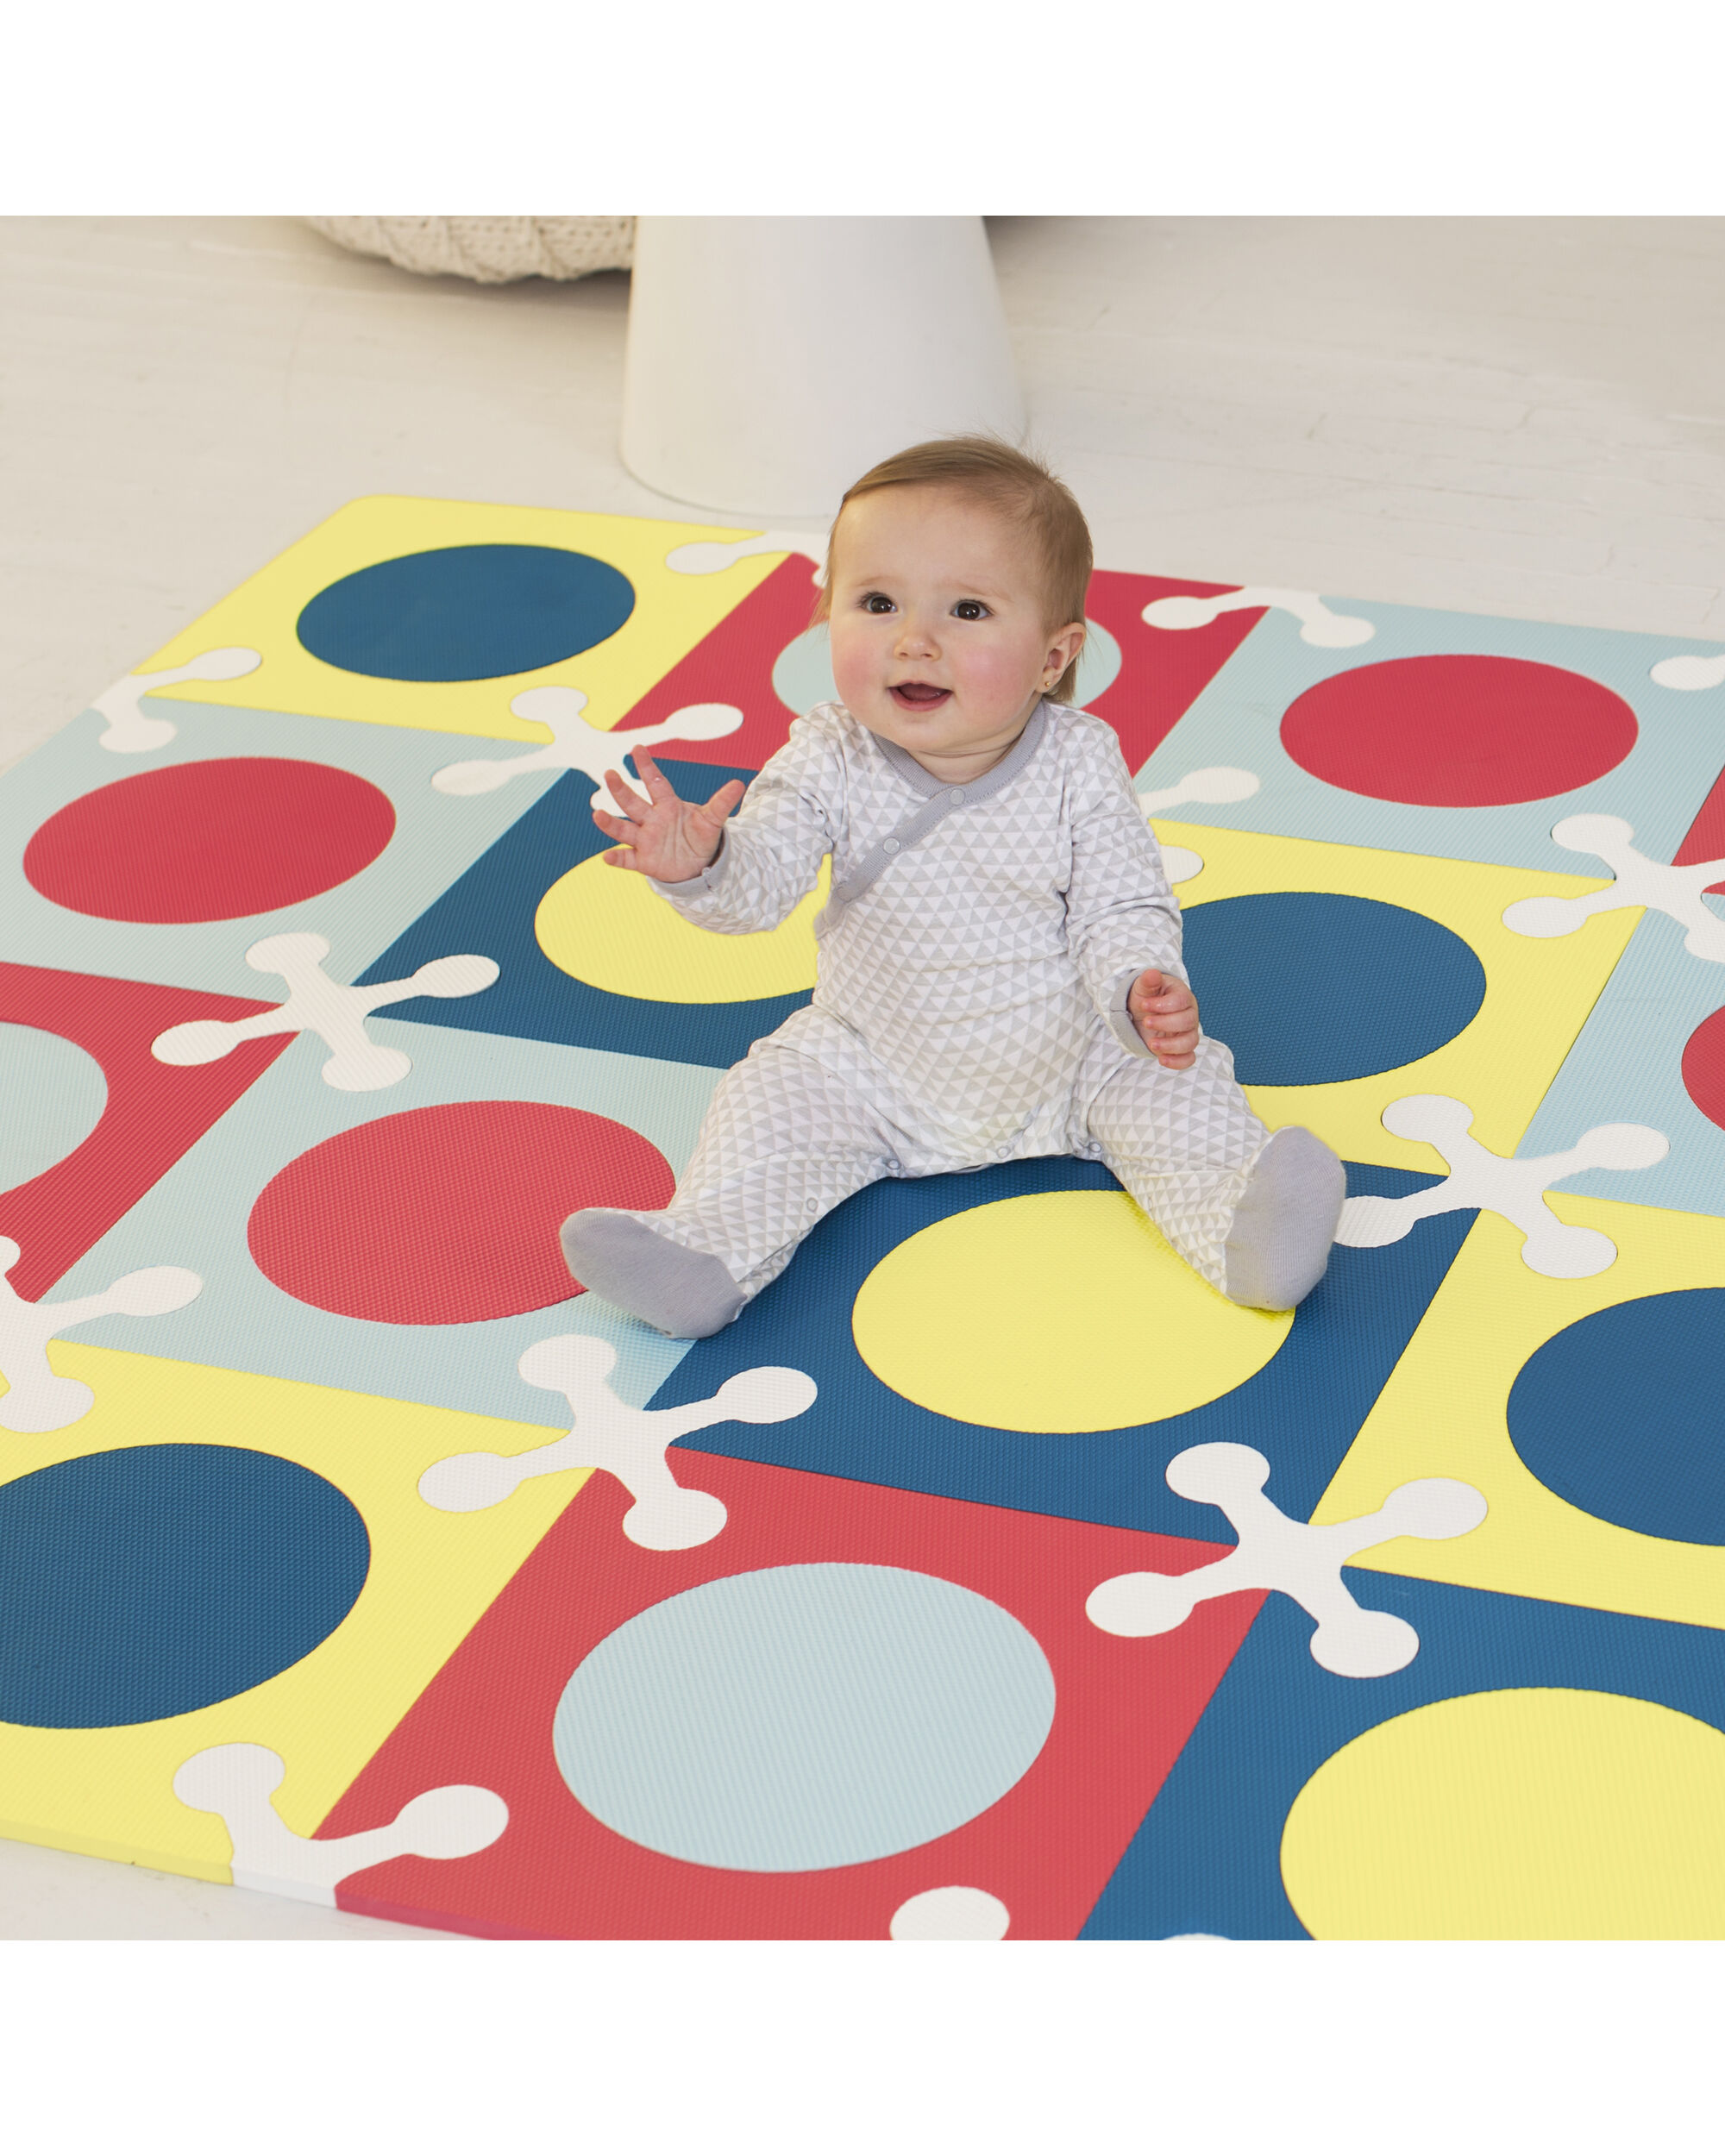 Skip Hop Foam Tiles Toxic Tile Design Ideas